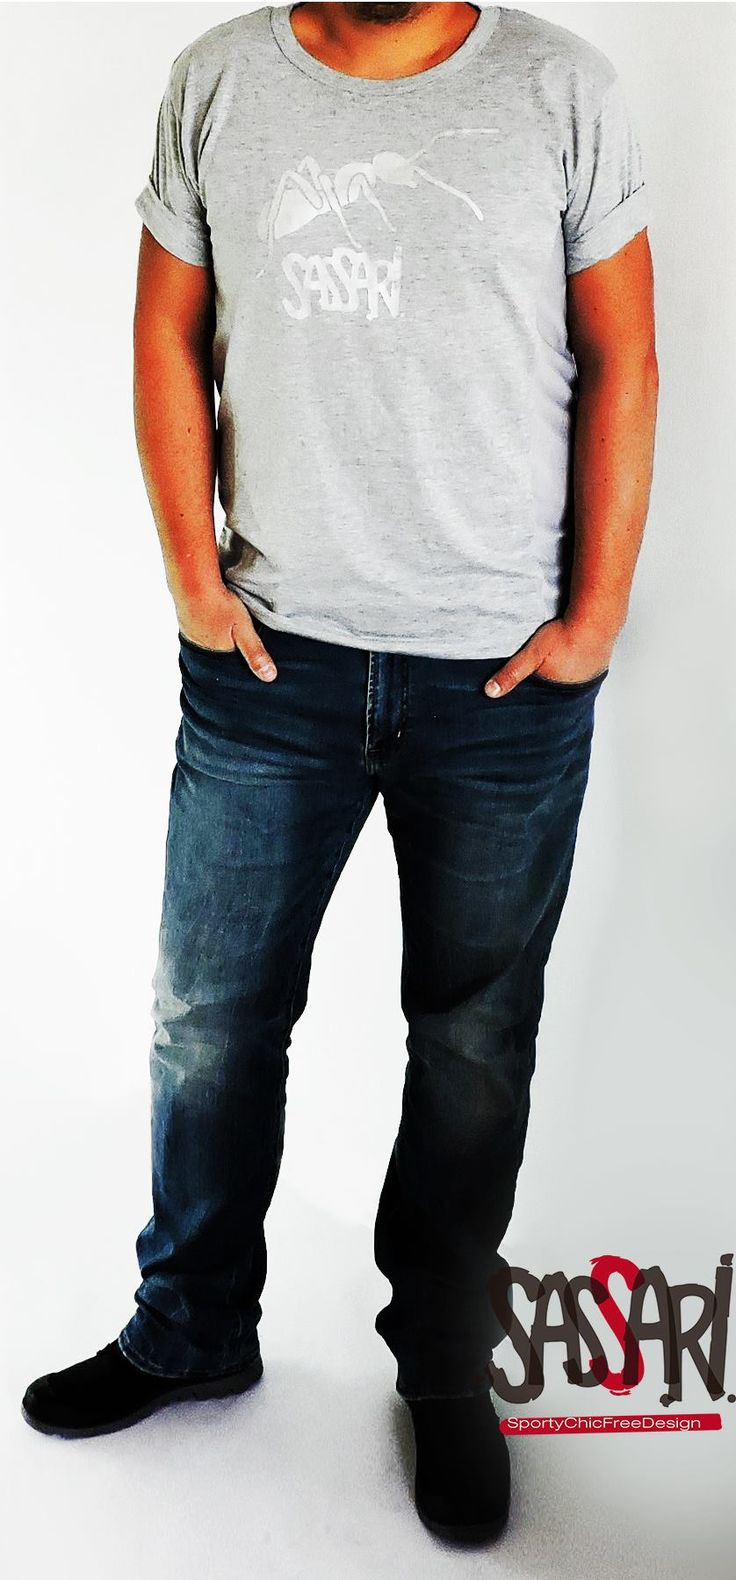 Polera manga Corta Costados con tela respirable Estampado Sassari color plateado Diseño Exclusivo Valor $ 12.900